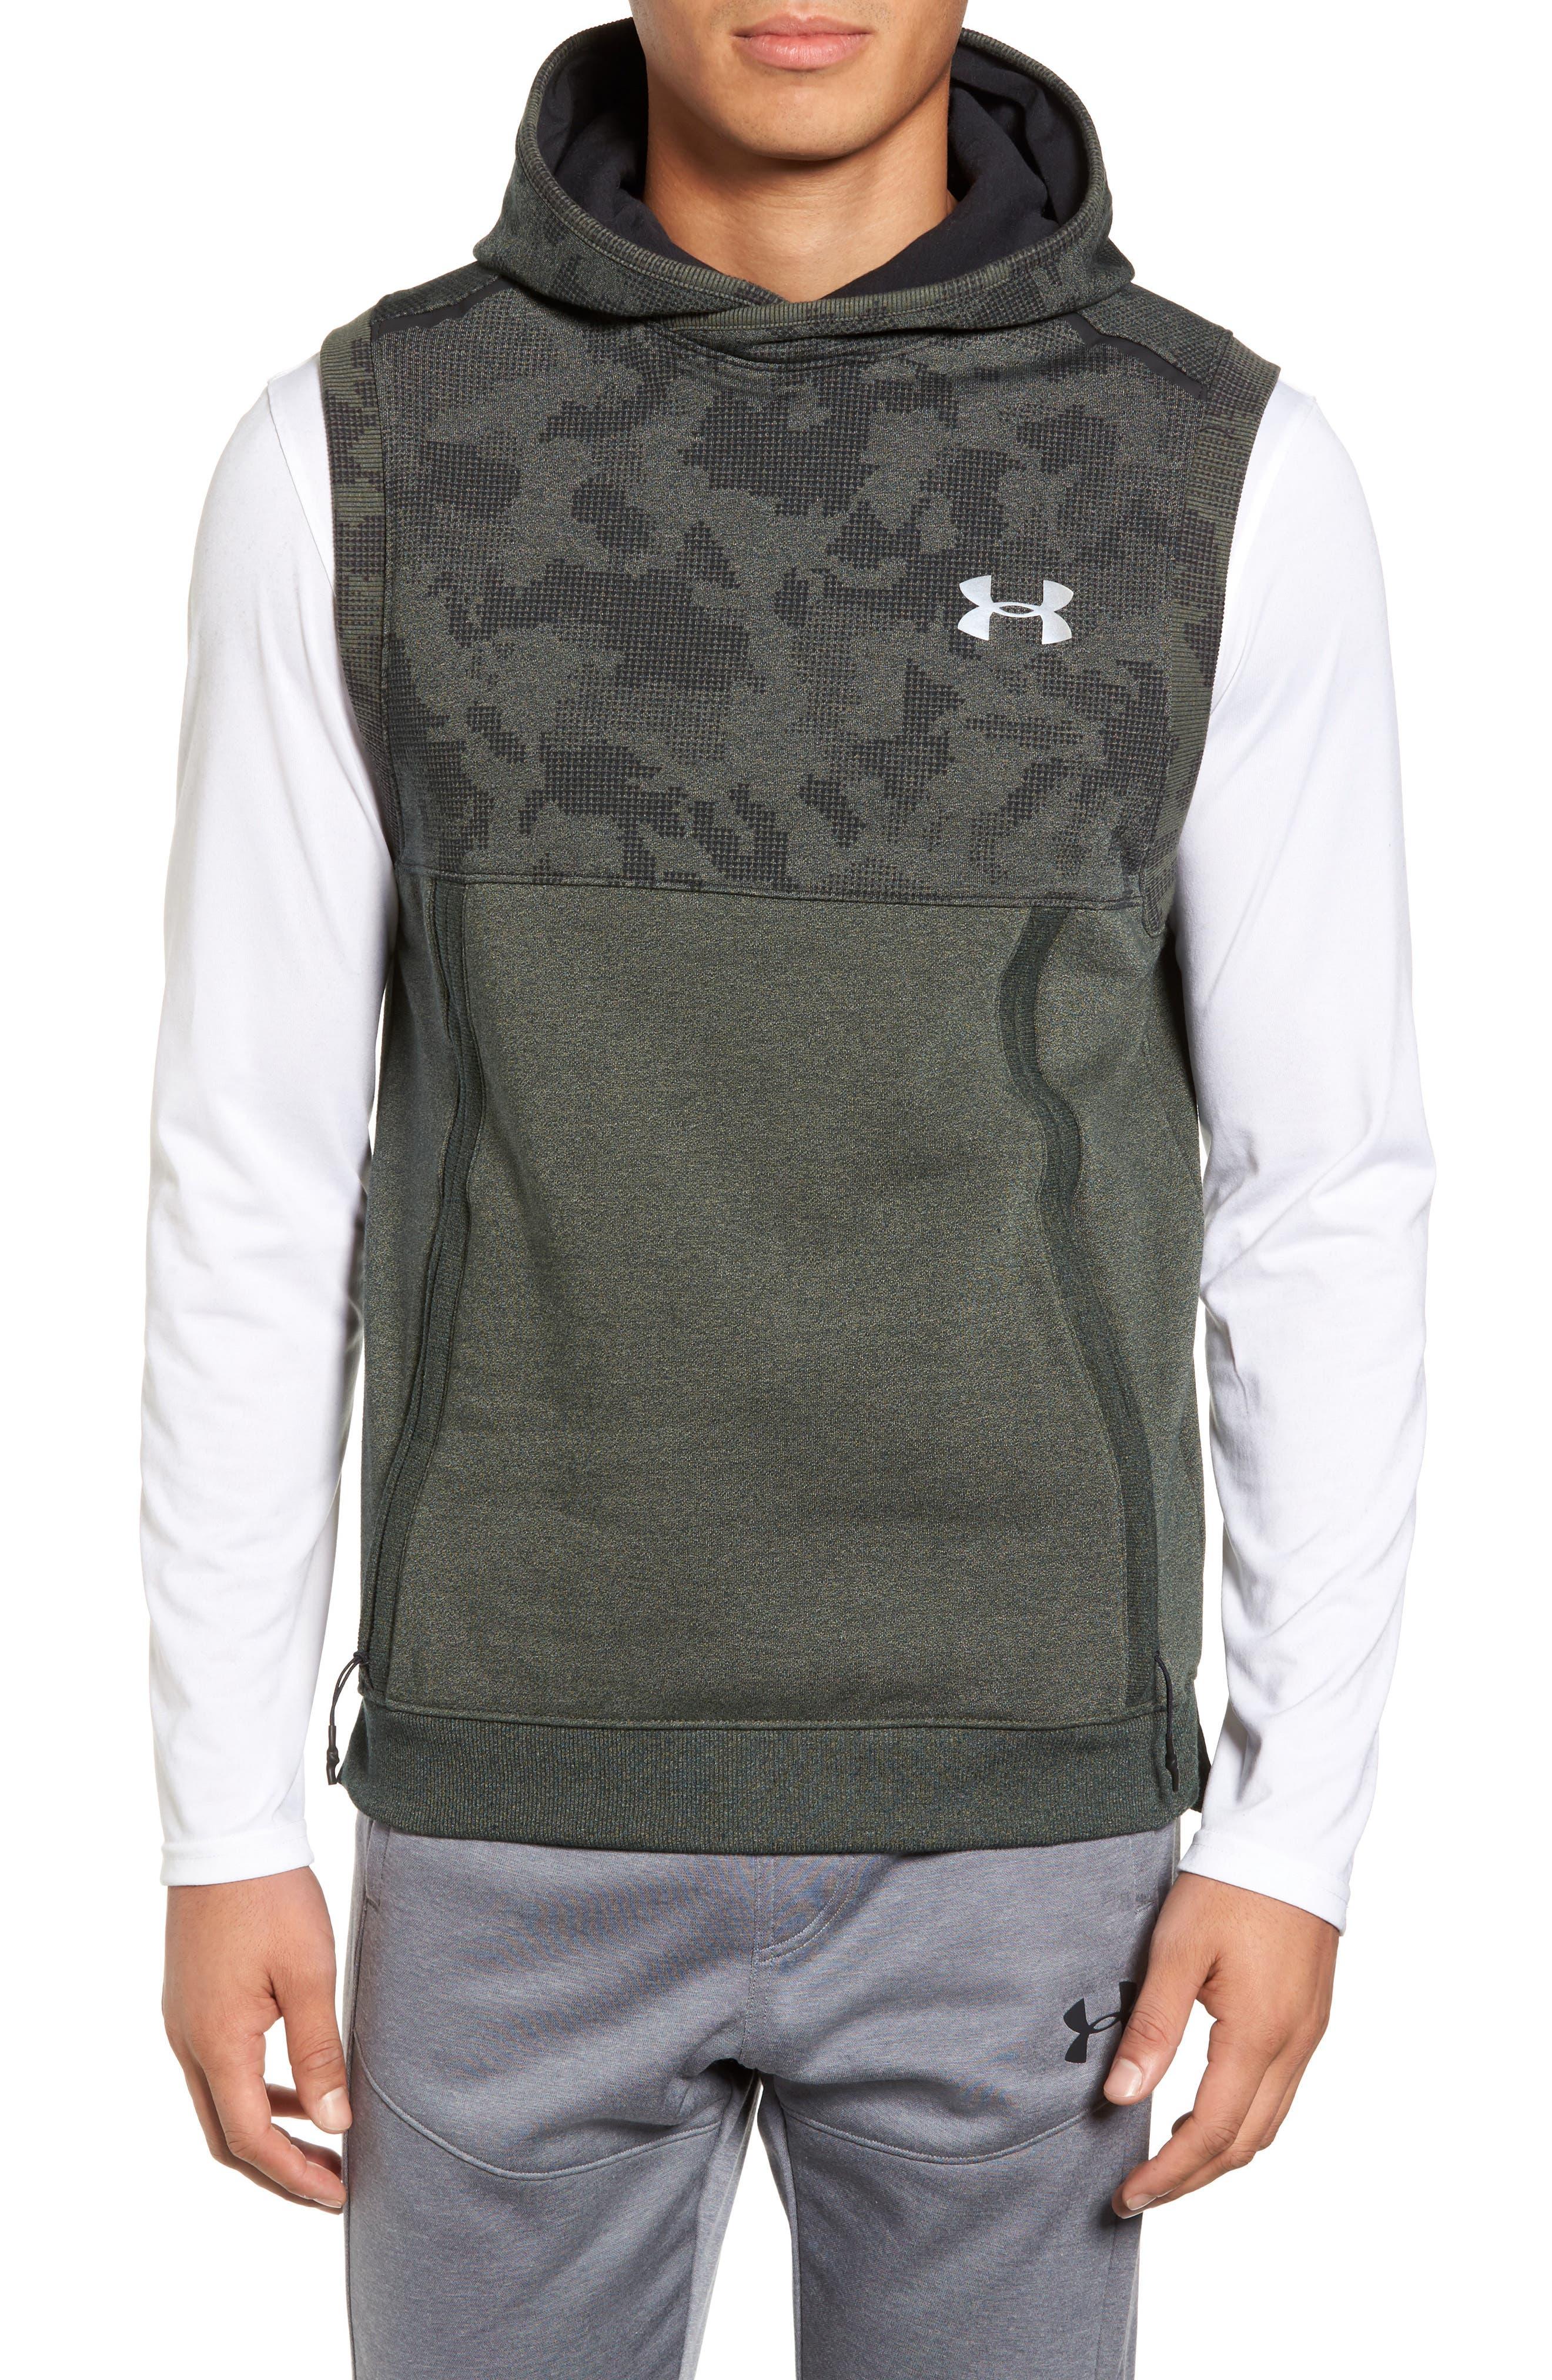 Main Image - Under Armour Threadborne Hooded Vest